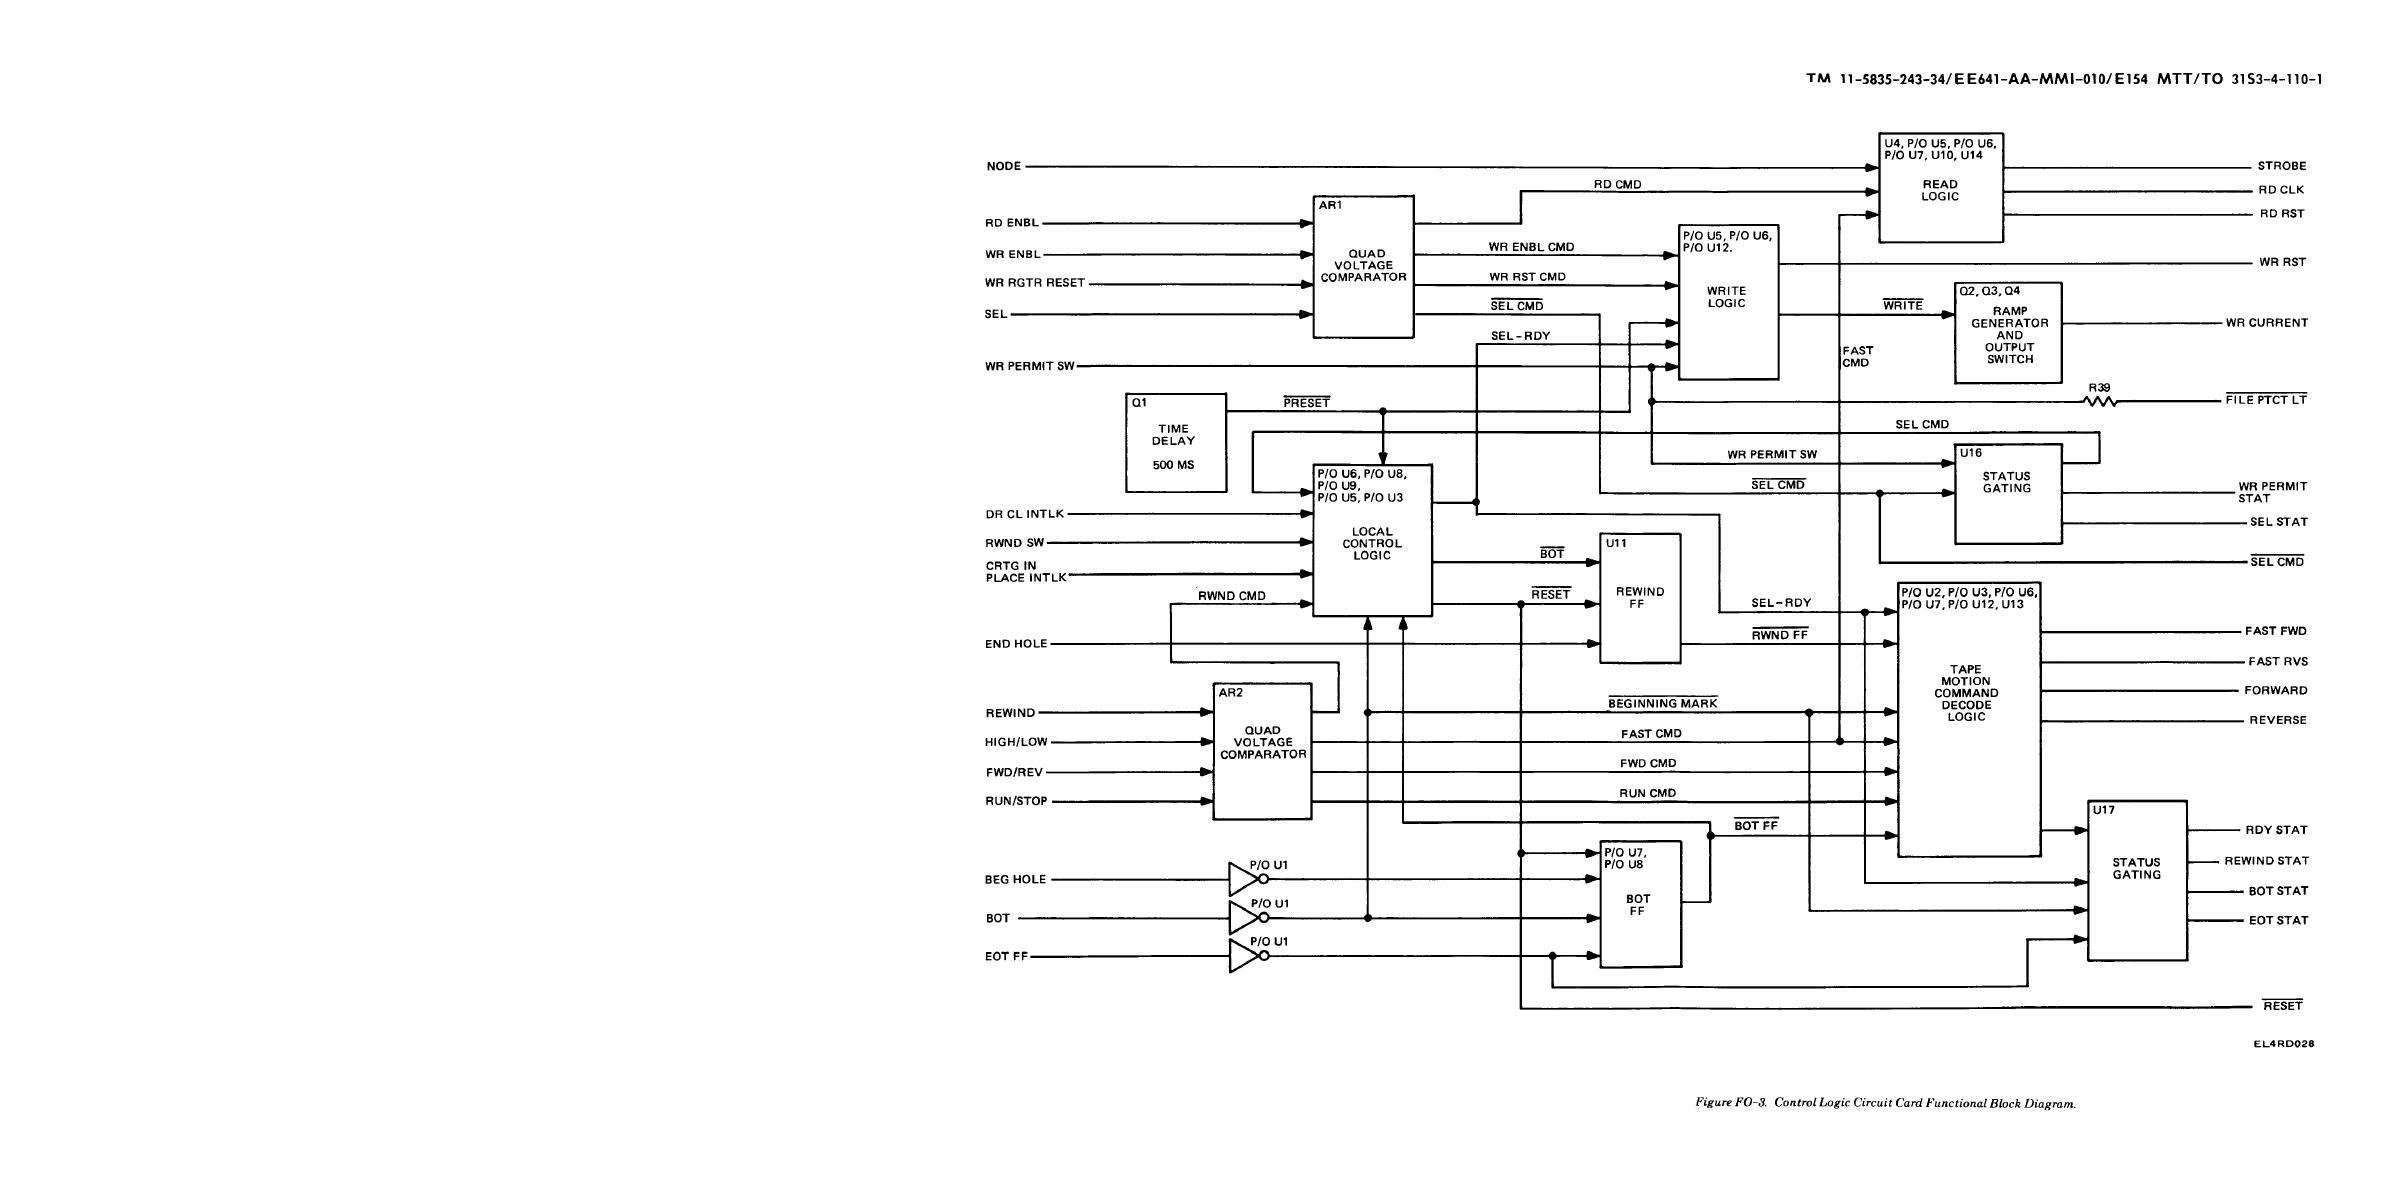 combinational logic circuits vs sequential logic circuits